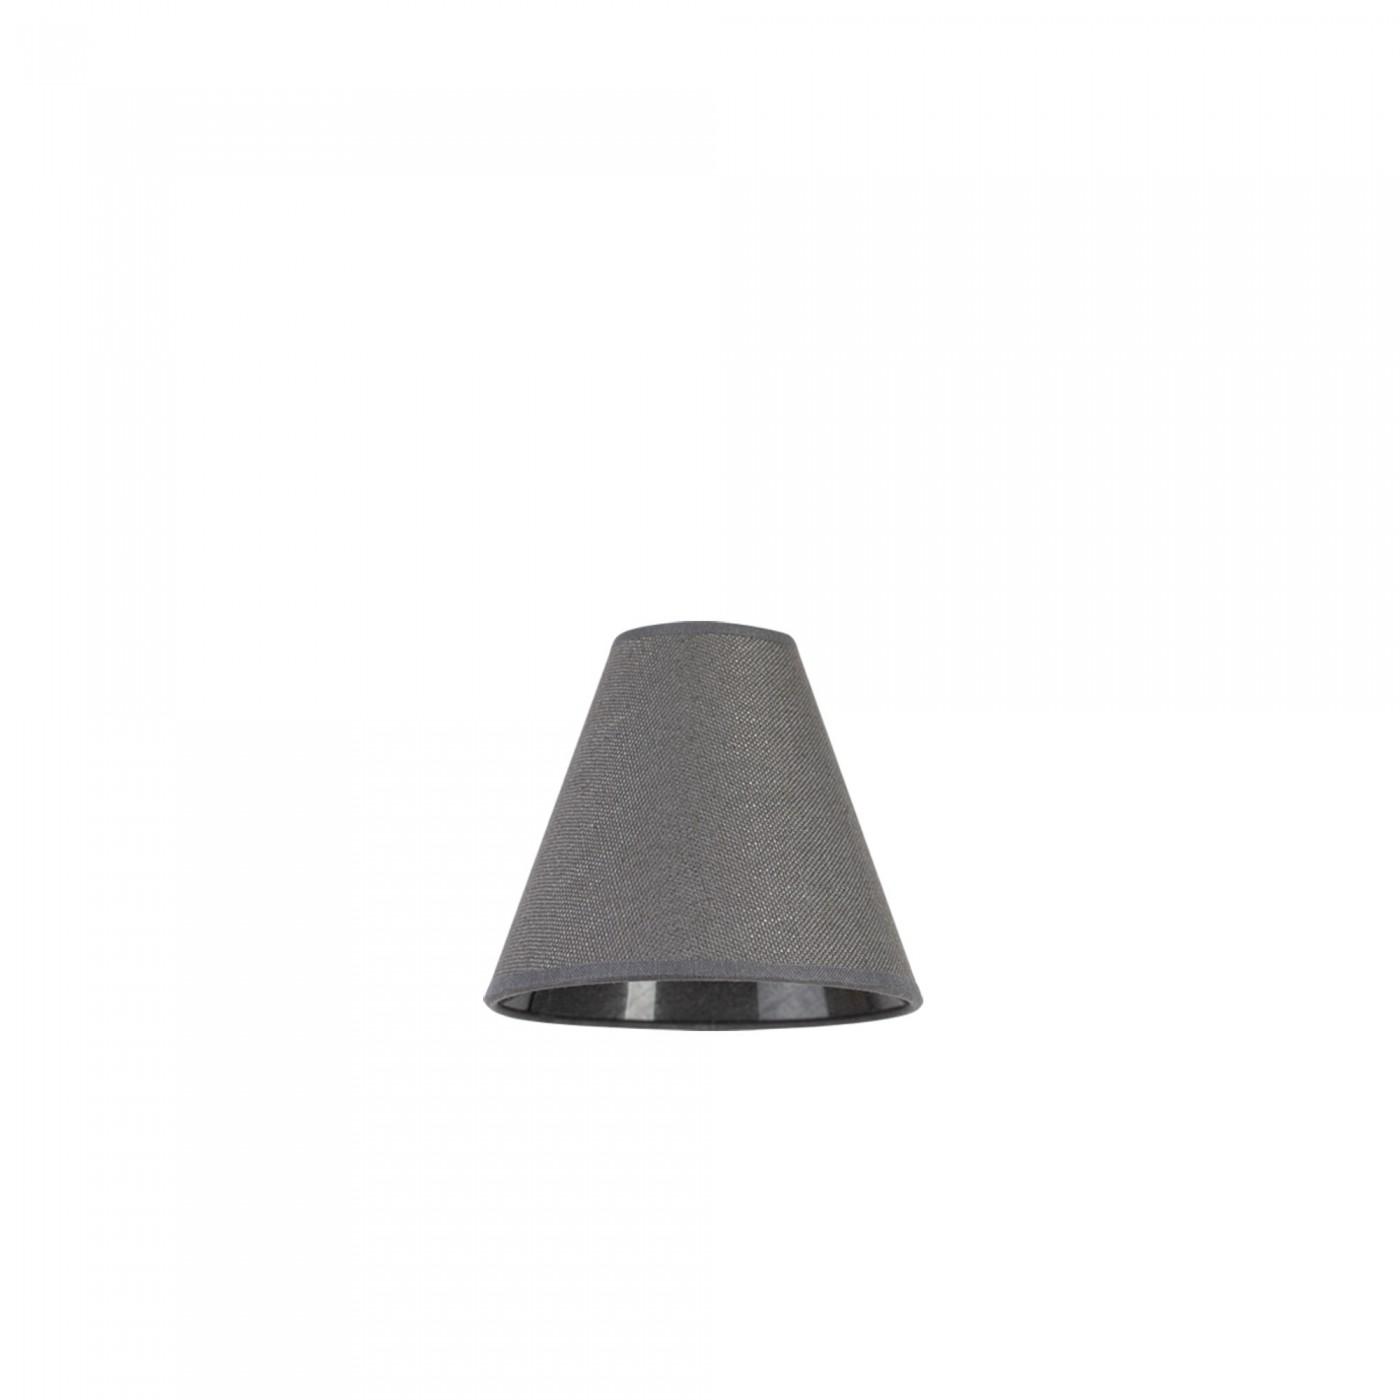 CAMELEON CONE S GY 8505 Nowodvorski Lighting